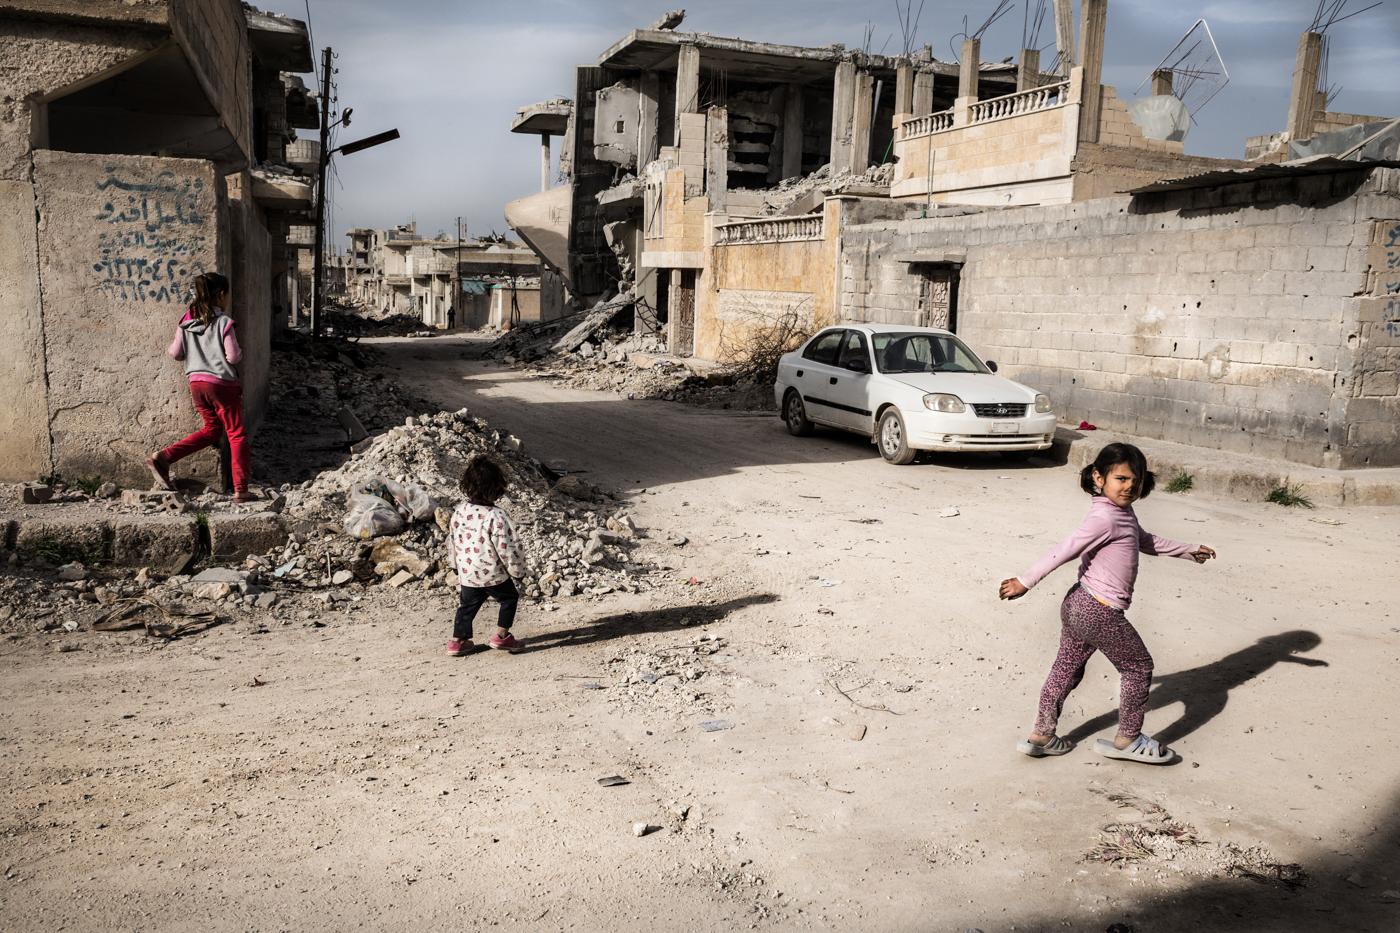 Giacomo_Sini_Italy_The_forgotten_people_of_Kurdistan_06.jpg